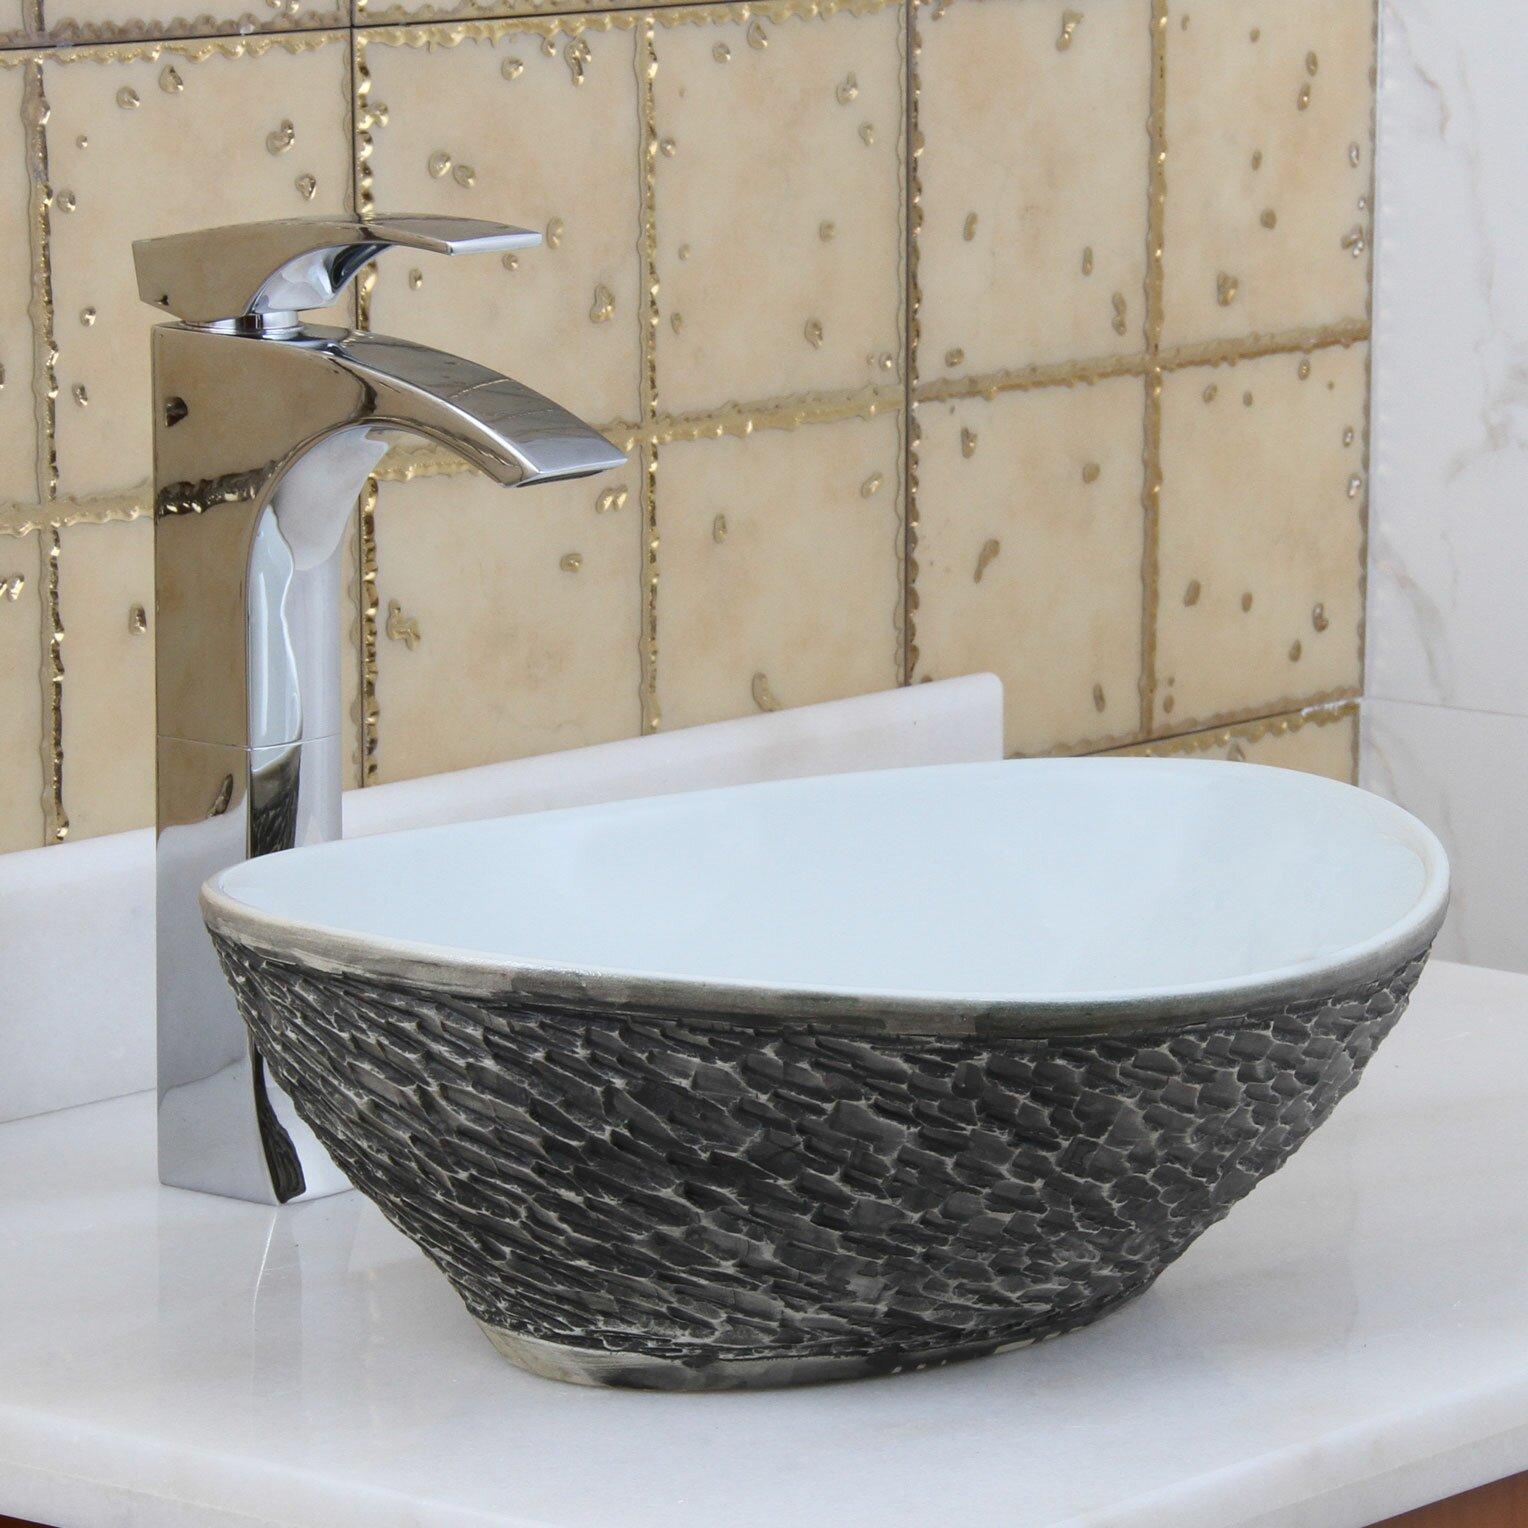 Elite bathroom sinks - Elite Bathroom Sinks